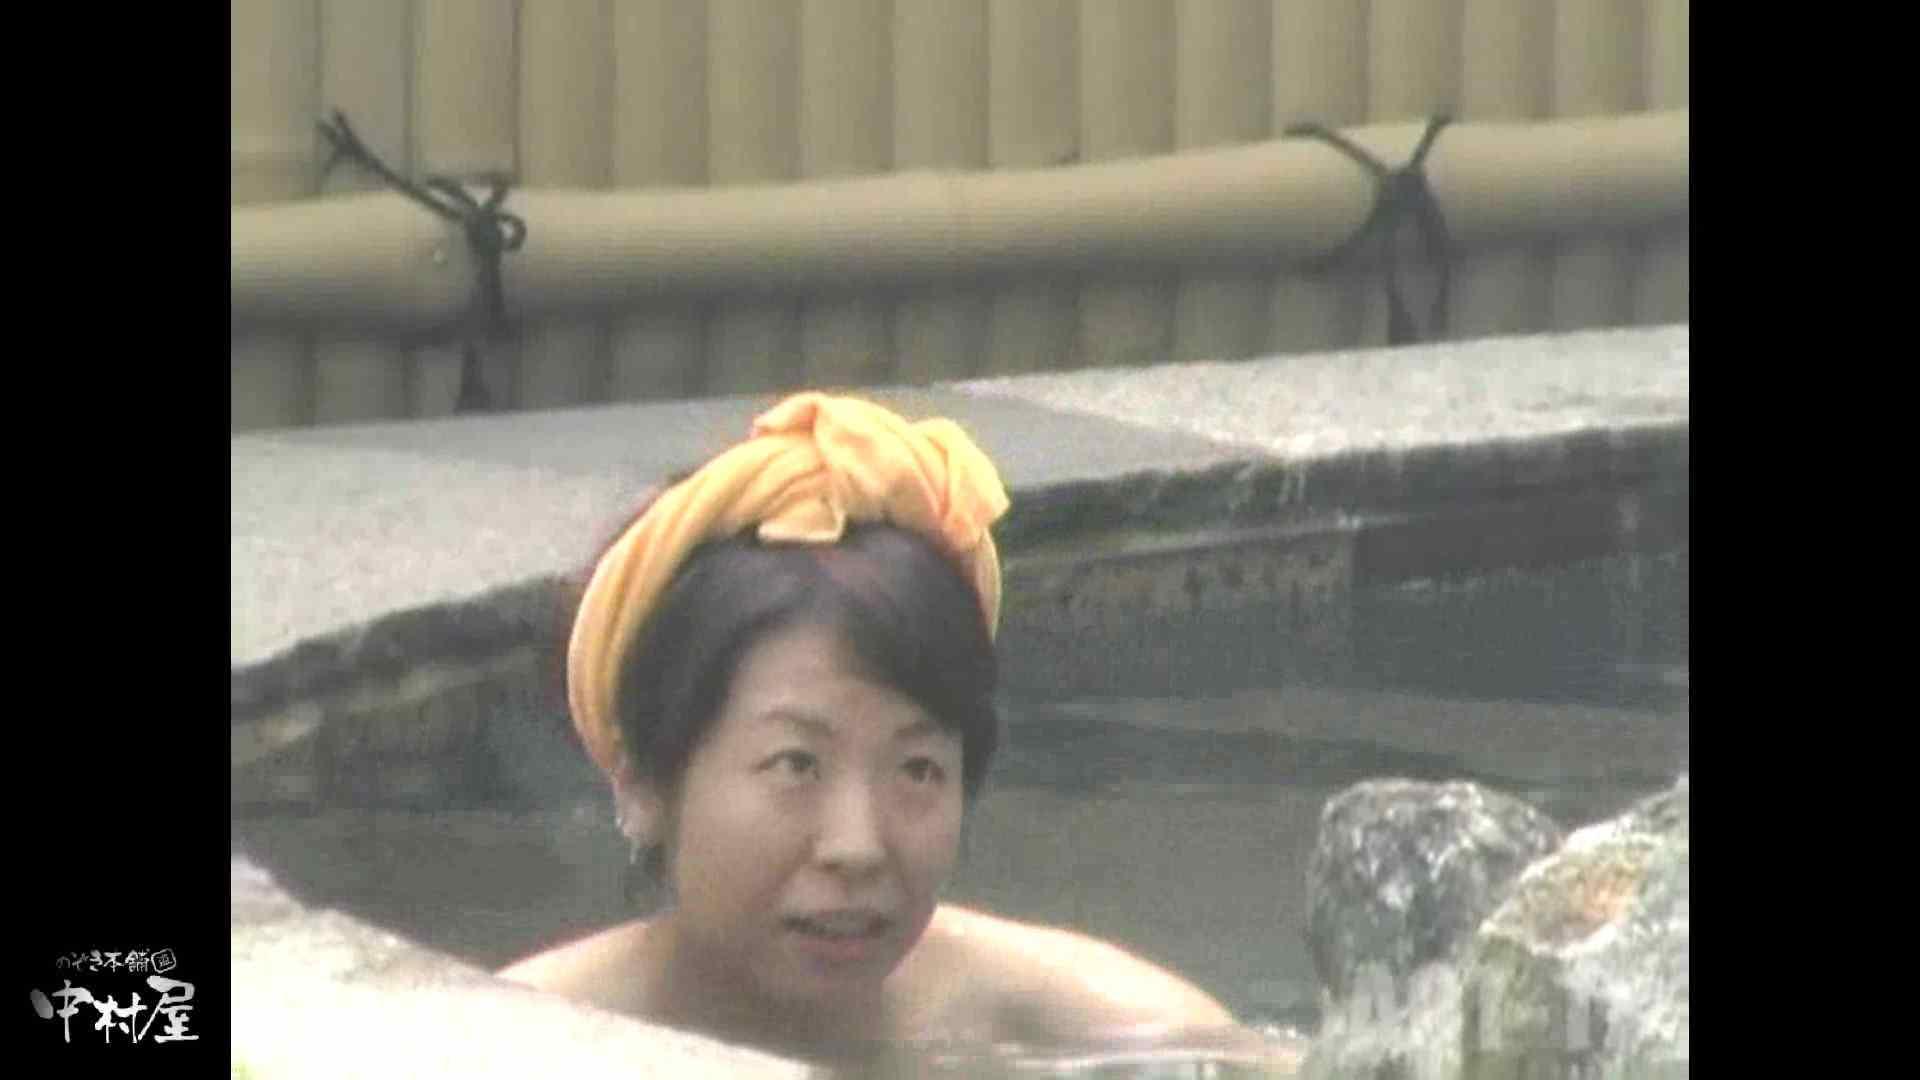 Aquaな露天風呂Vol.881潜入盗撮露天風呂十七判湯 其の五 潜入突撃  102pic 64